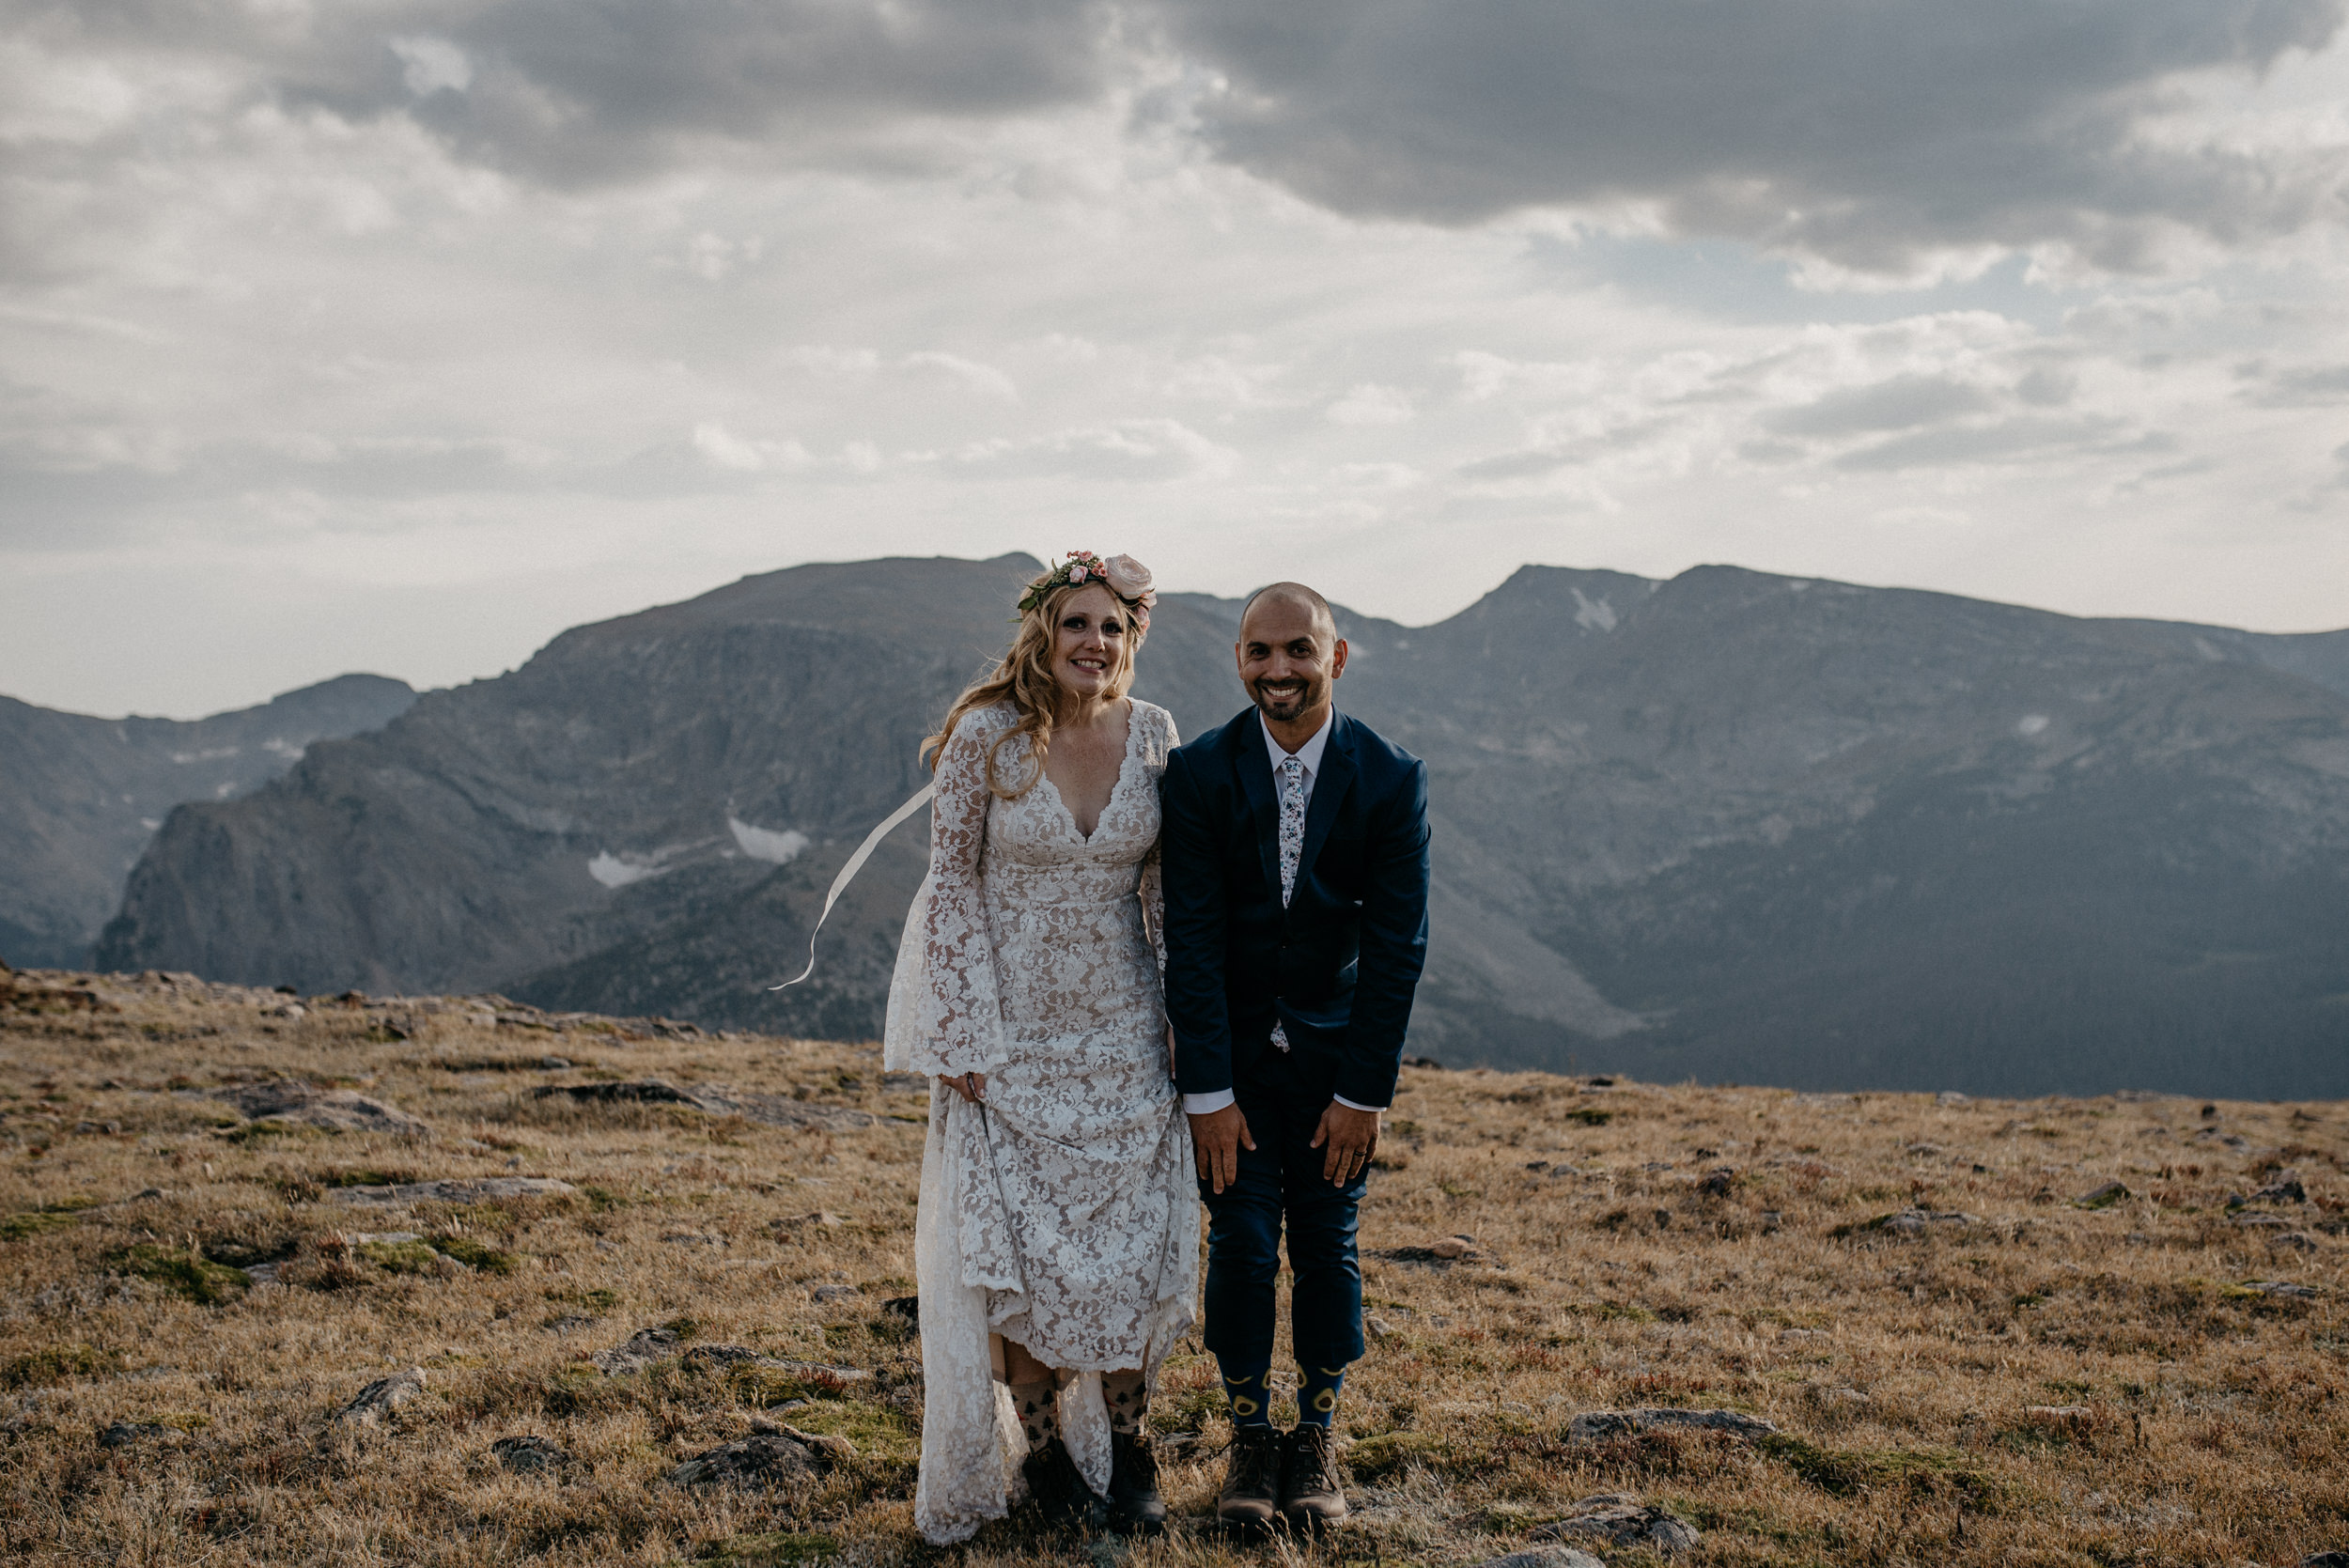 Trail Ridge Road adventure elopement photos in Rocky Mountain National Park.